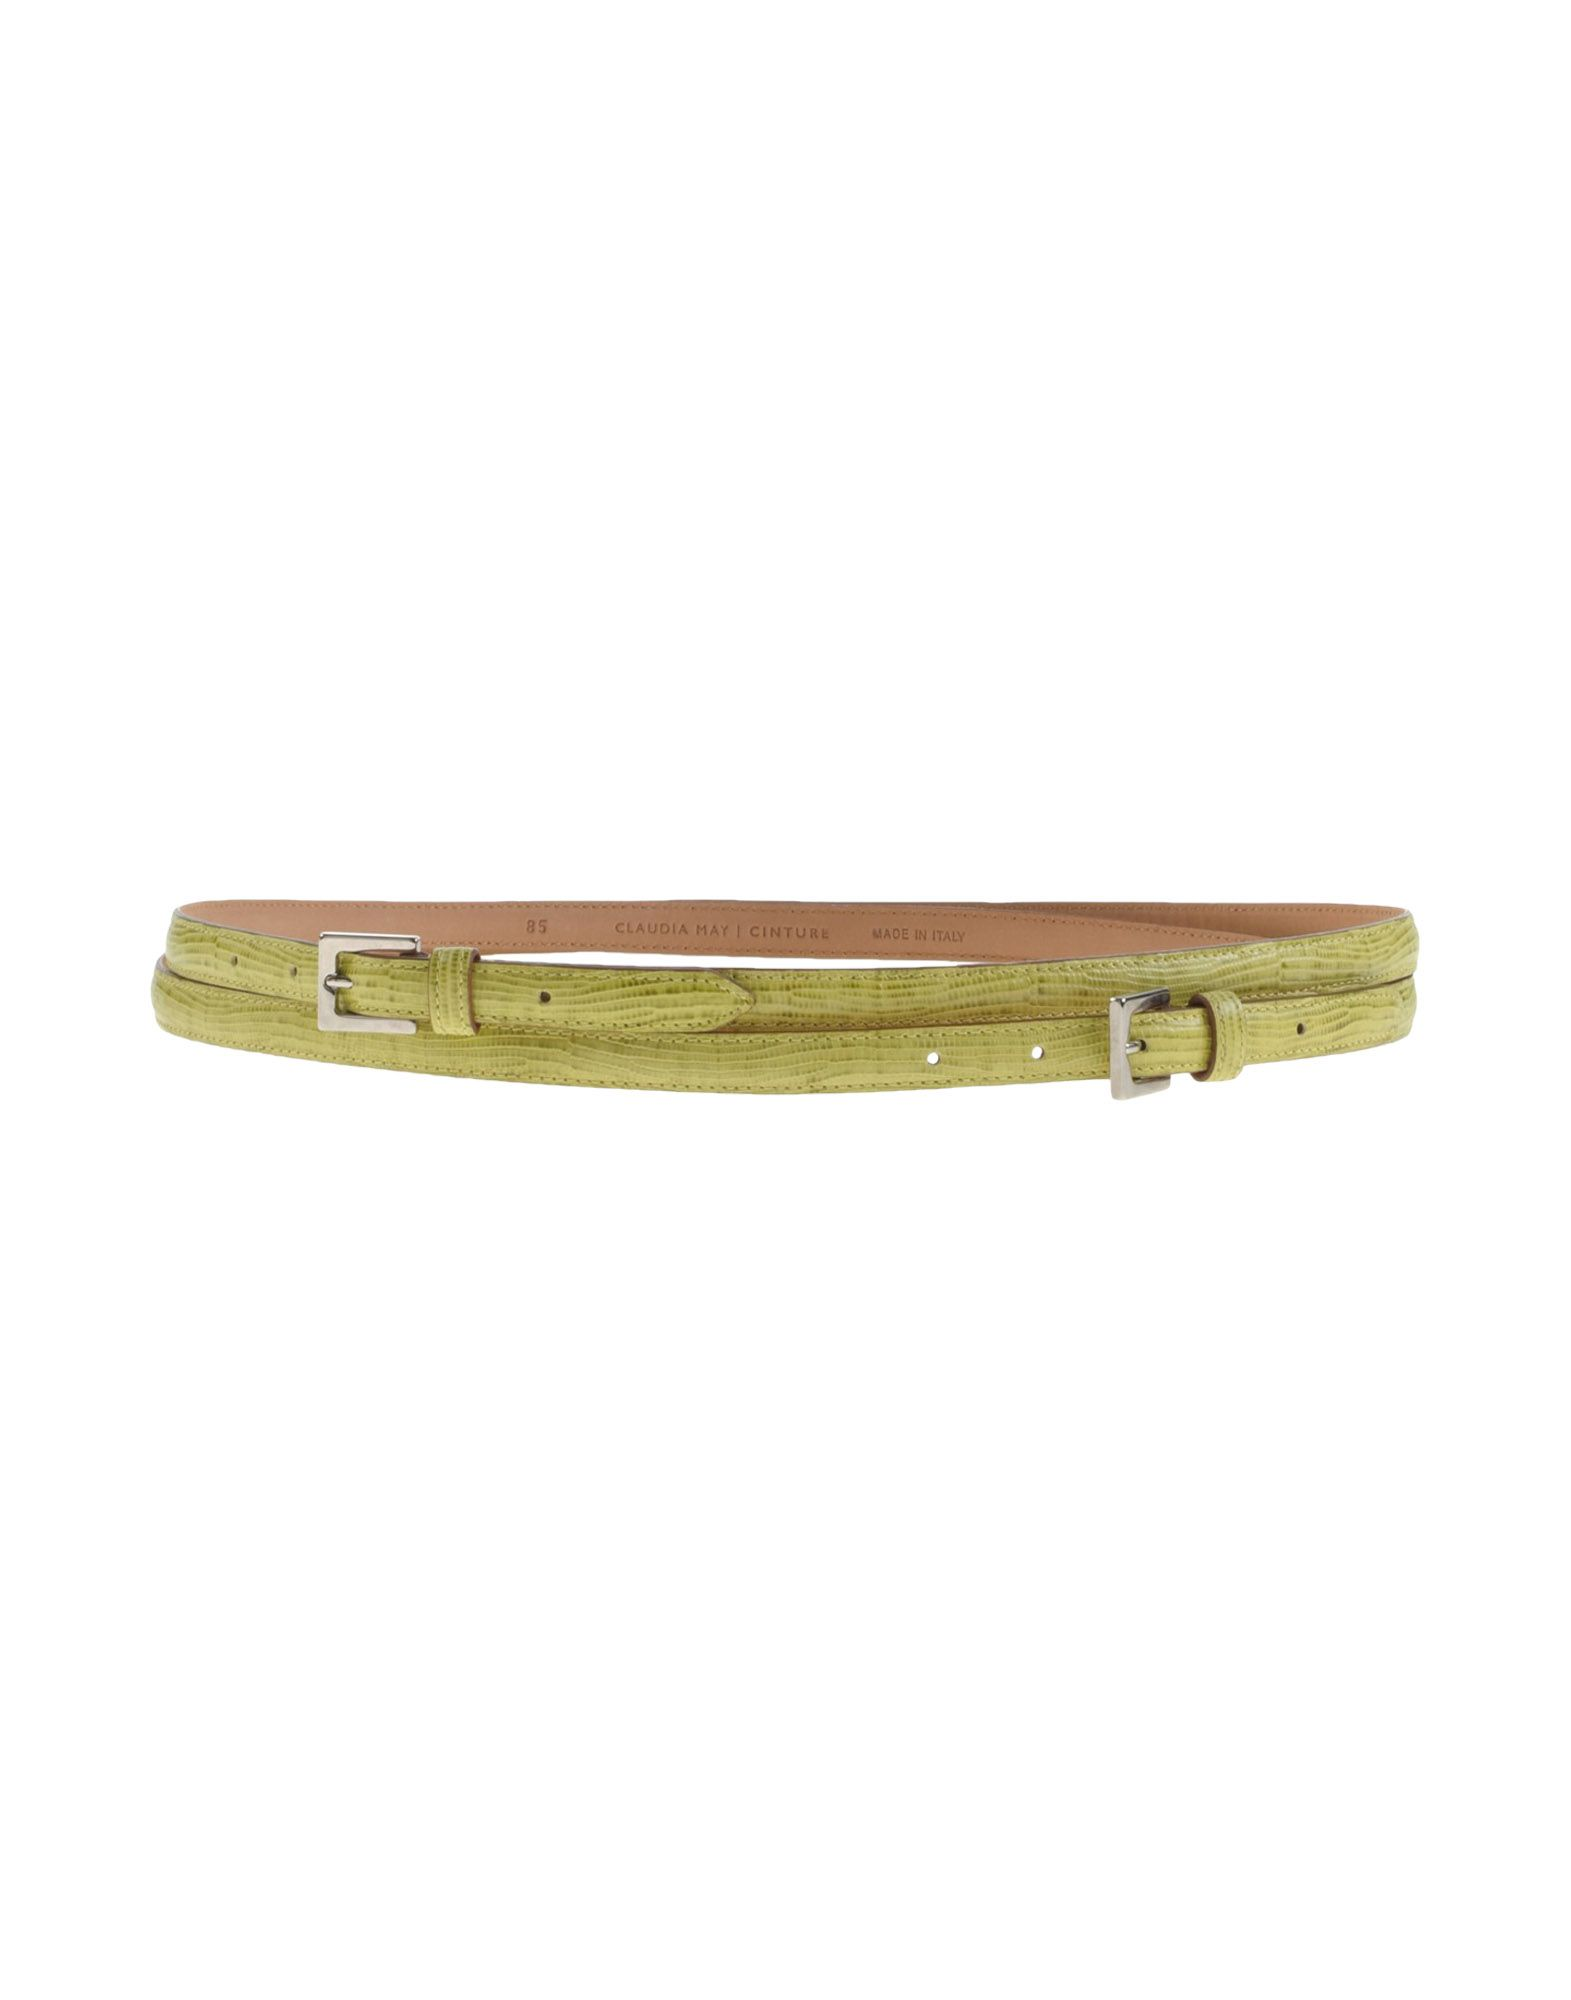 CLAUDIA MAY Belts